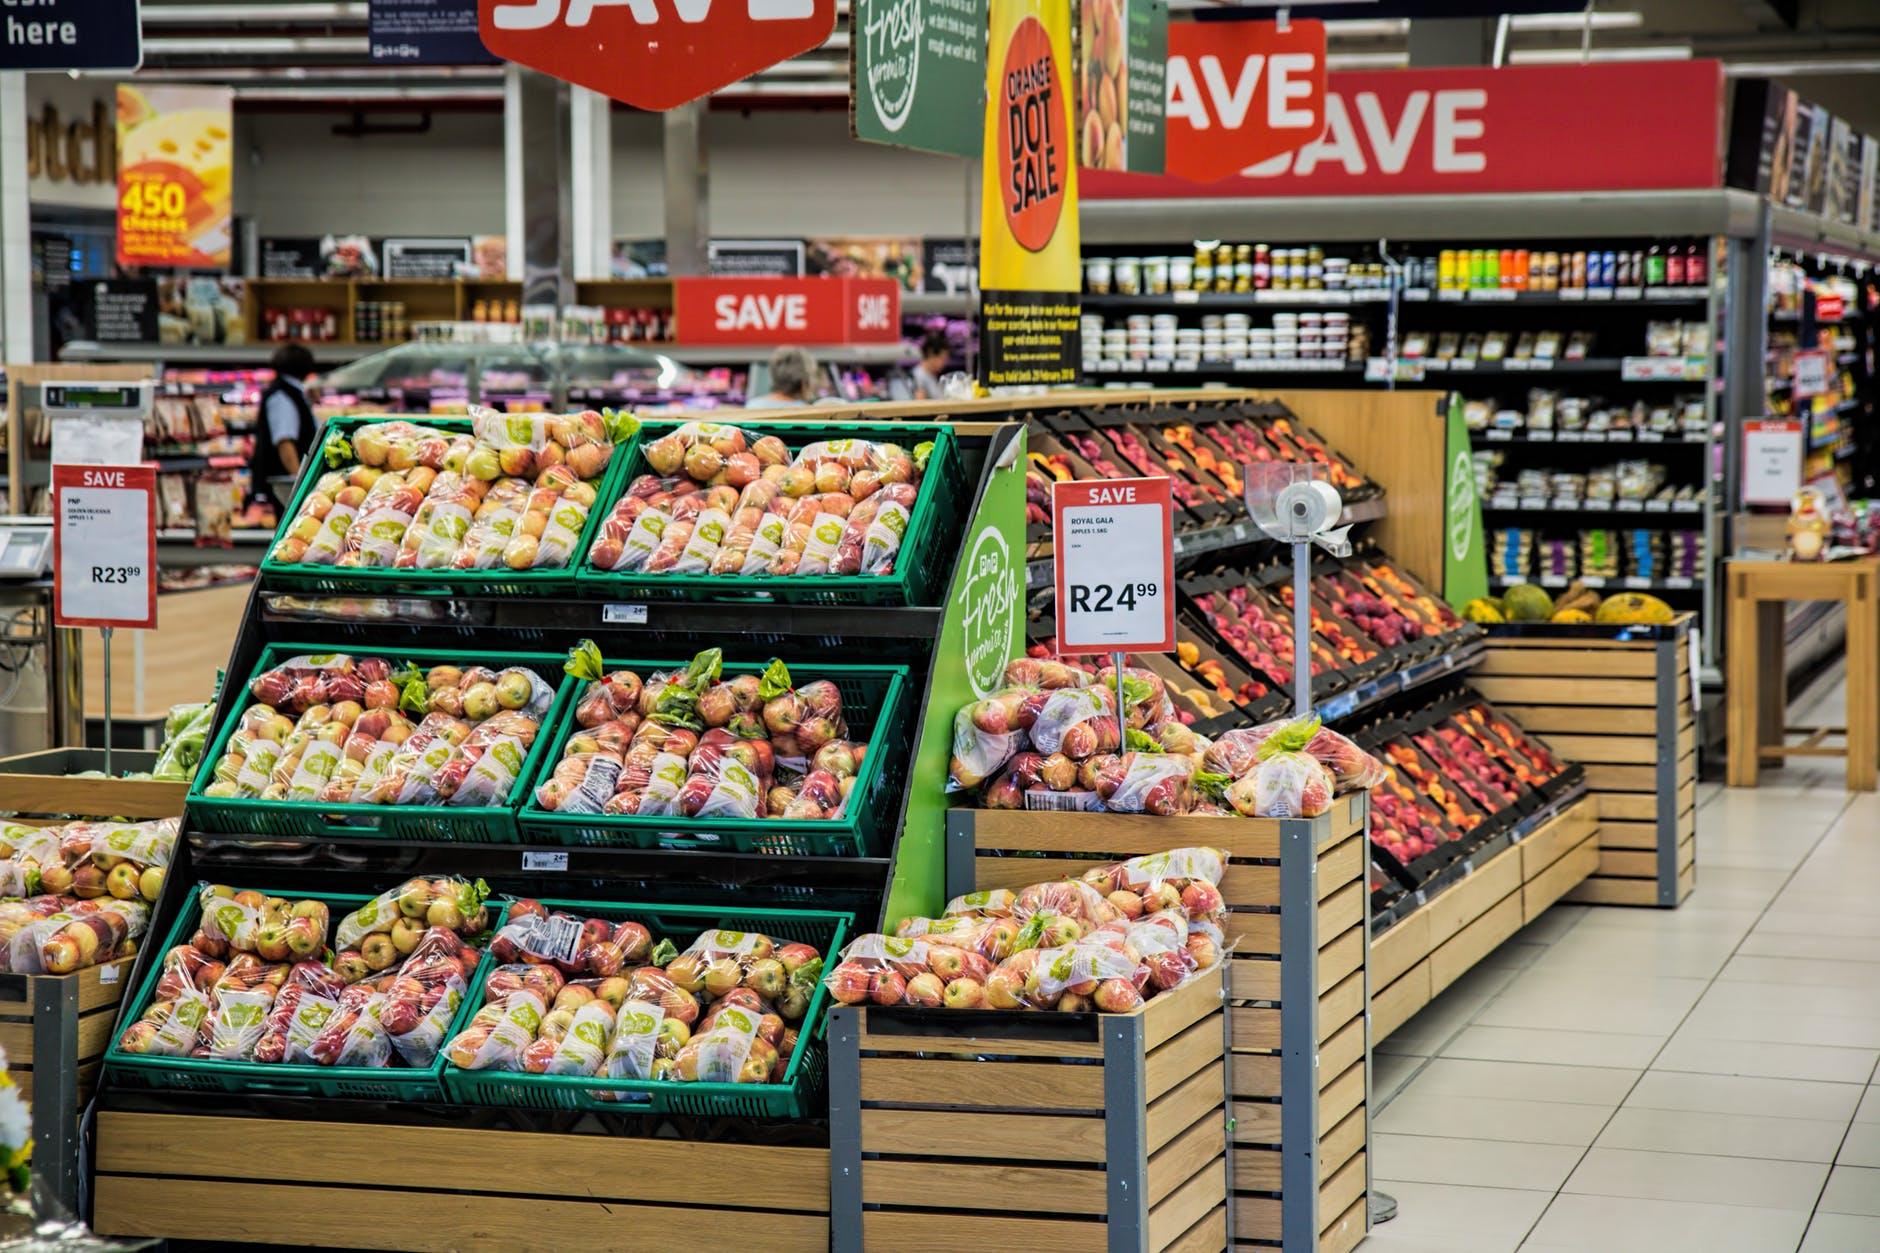 Untung Rugi Belanja Online vs Belanja di Supermarket